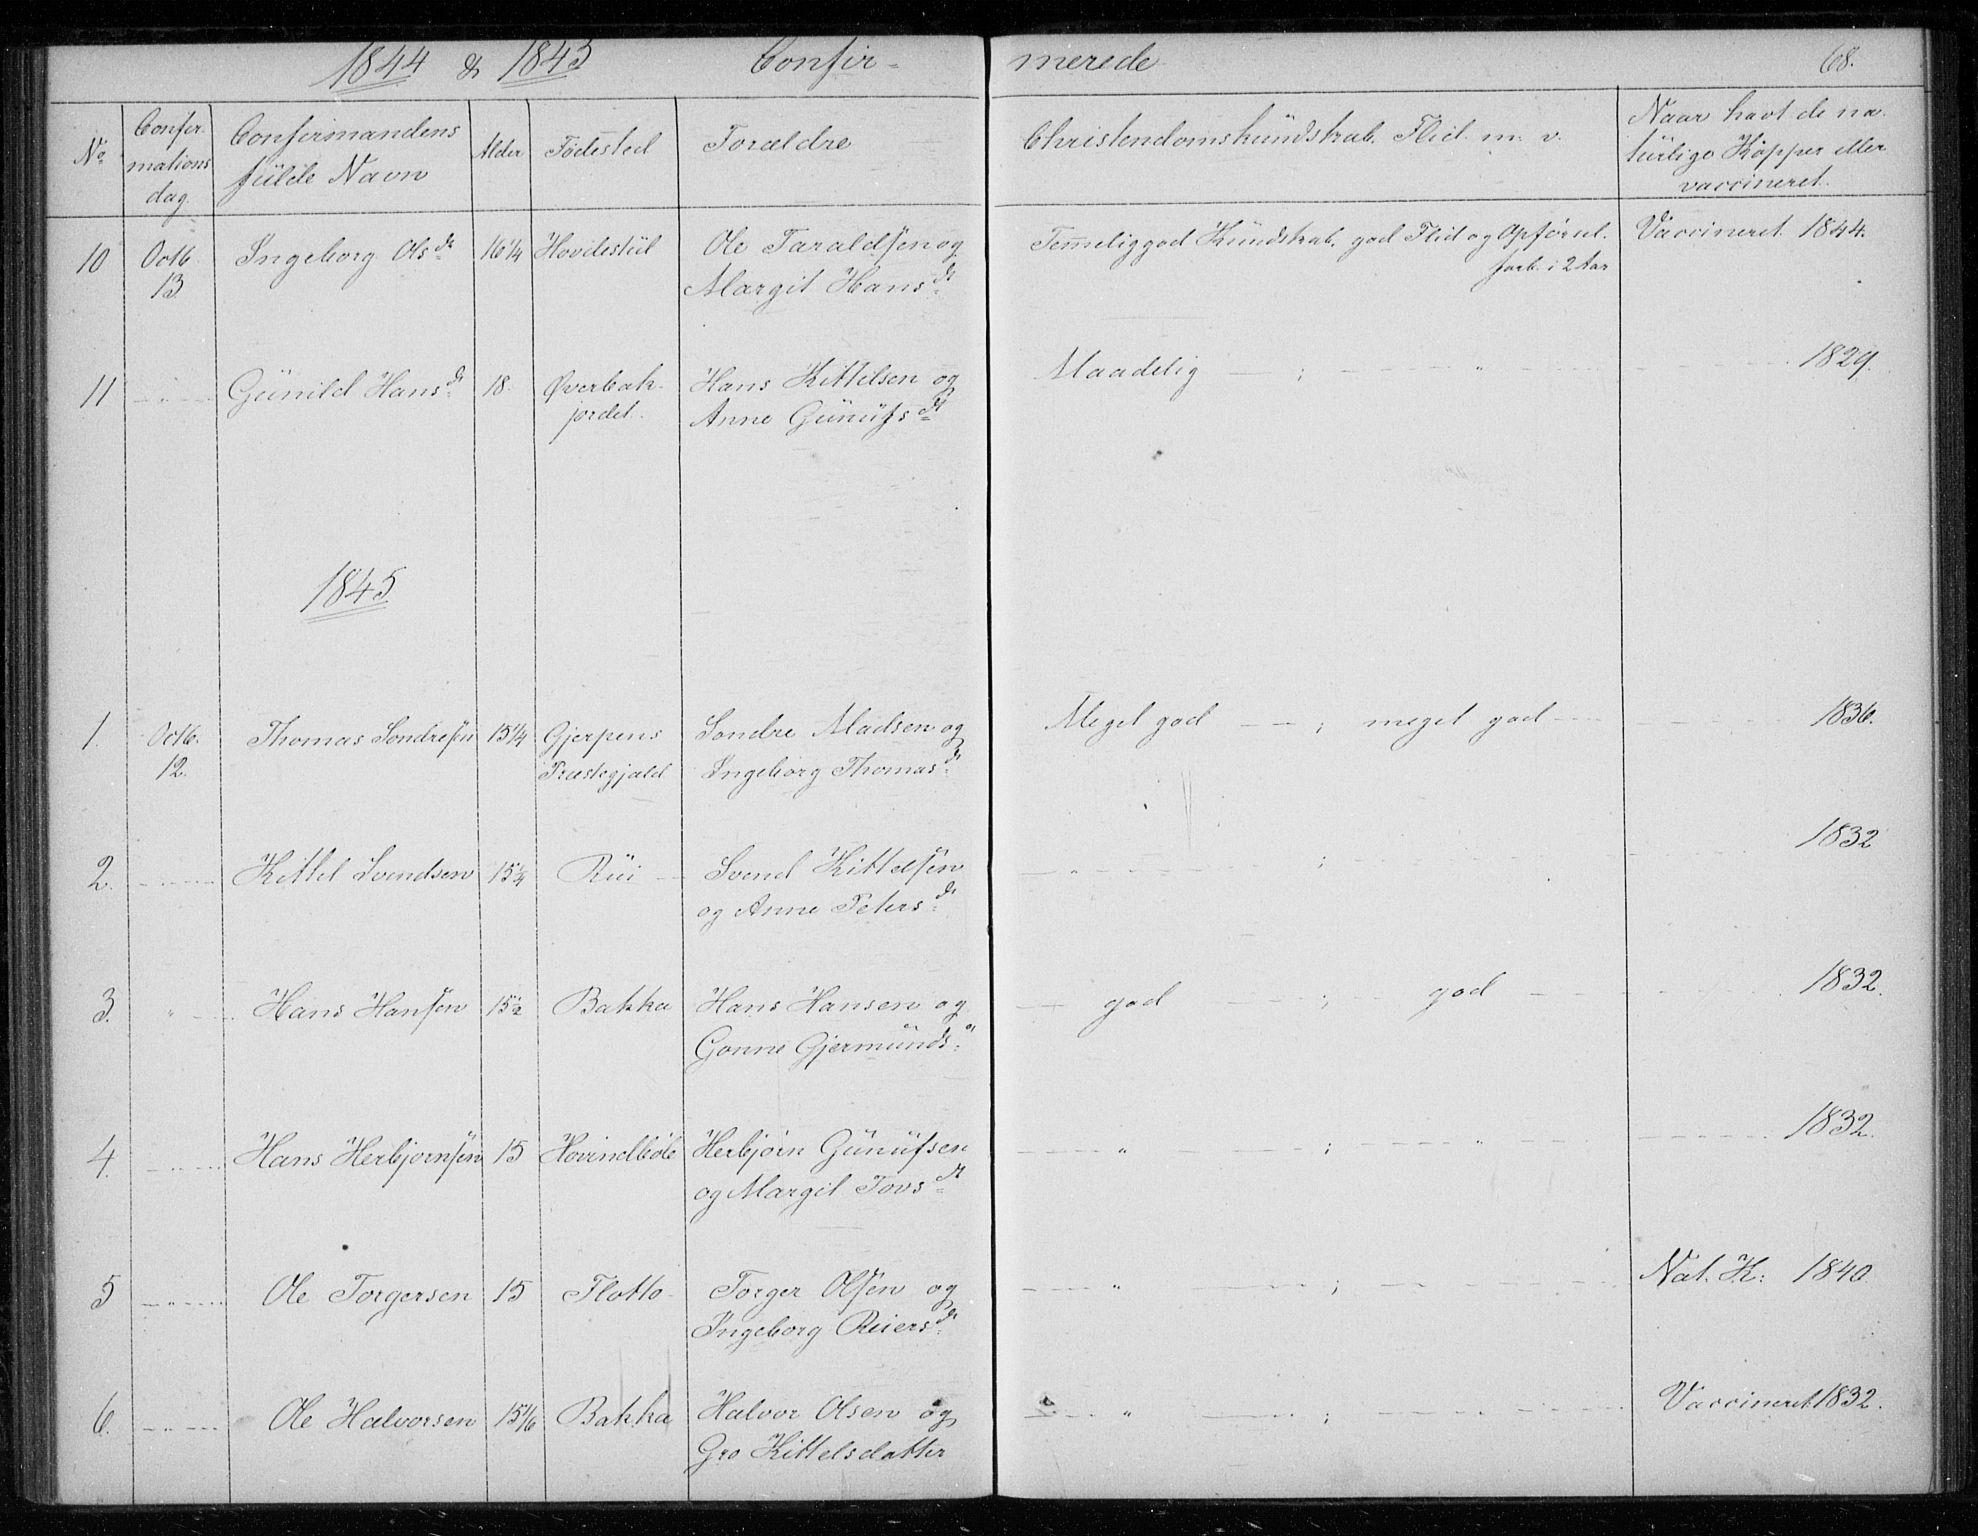 SAKO, Gransherad kirkebøker, F/Fb/L0003: Ministerialbok nr. II 3, 1844-1859, s. 68